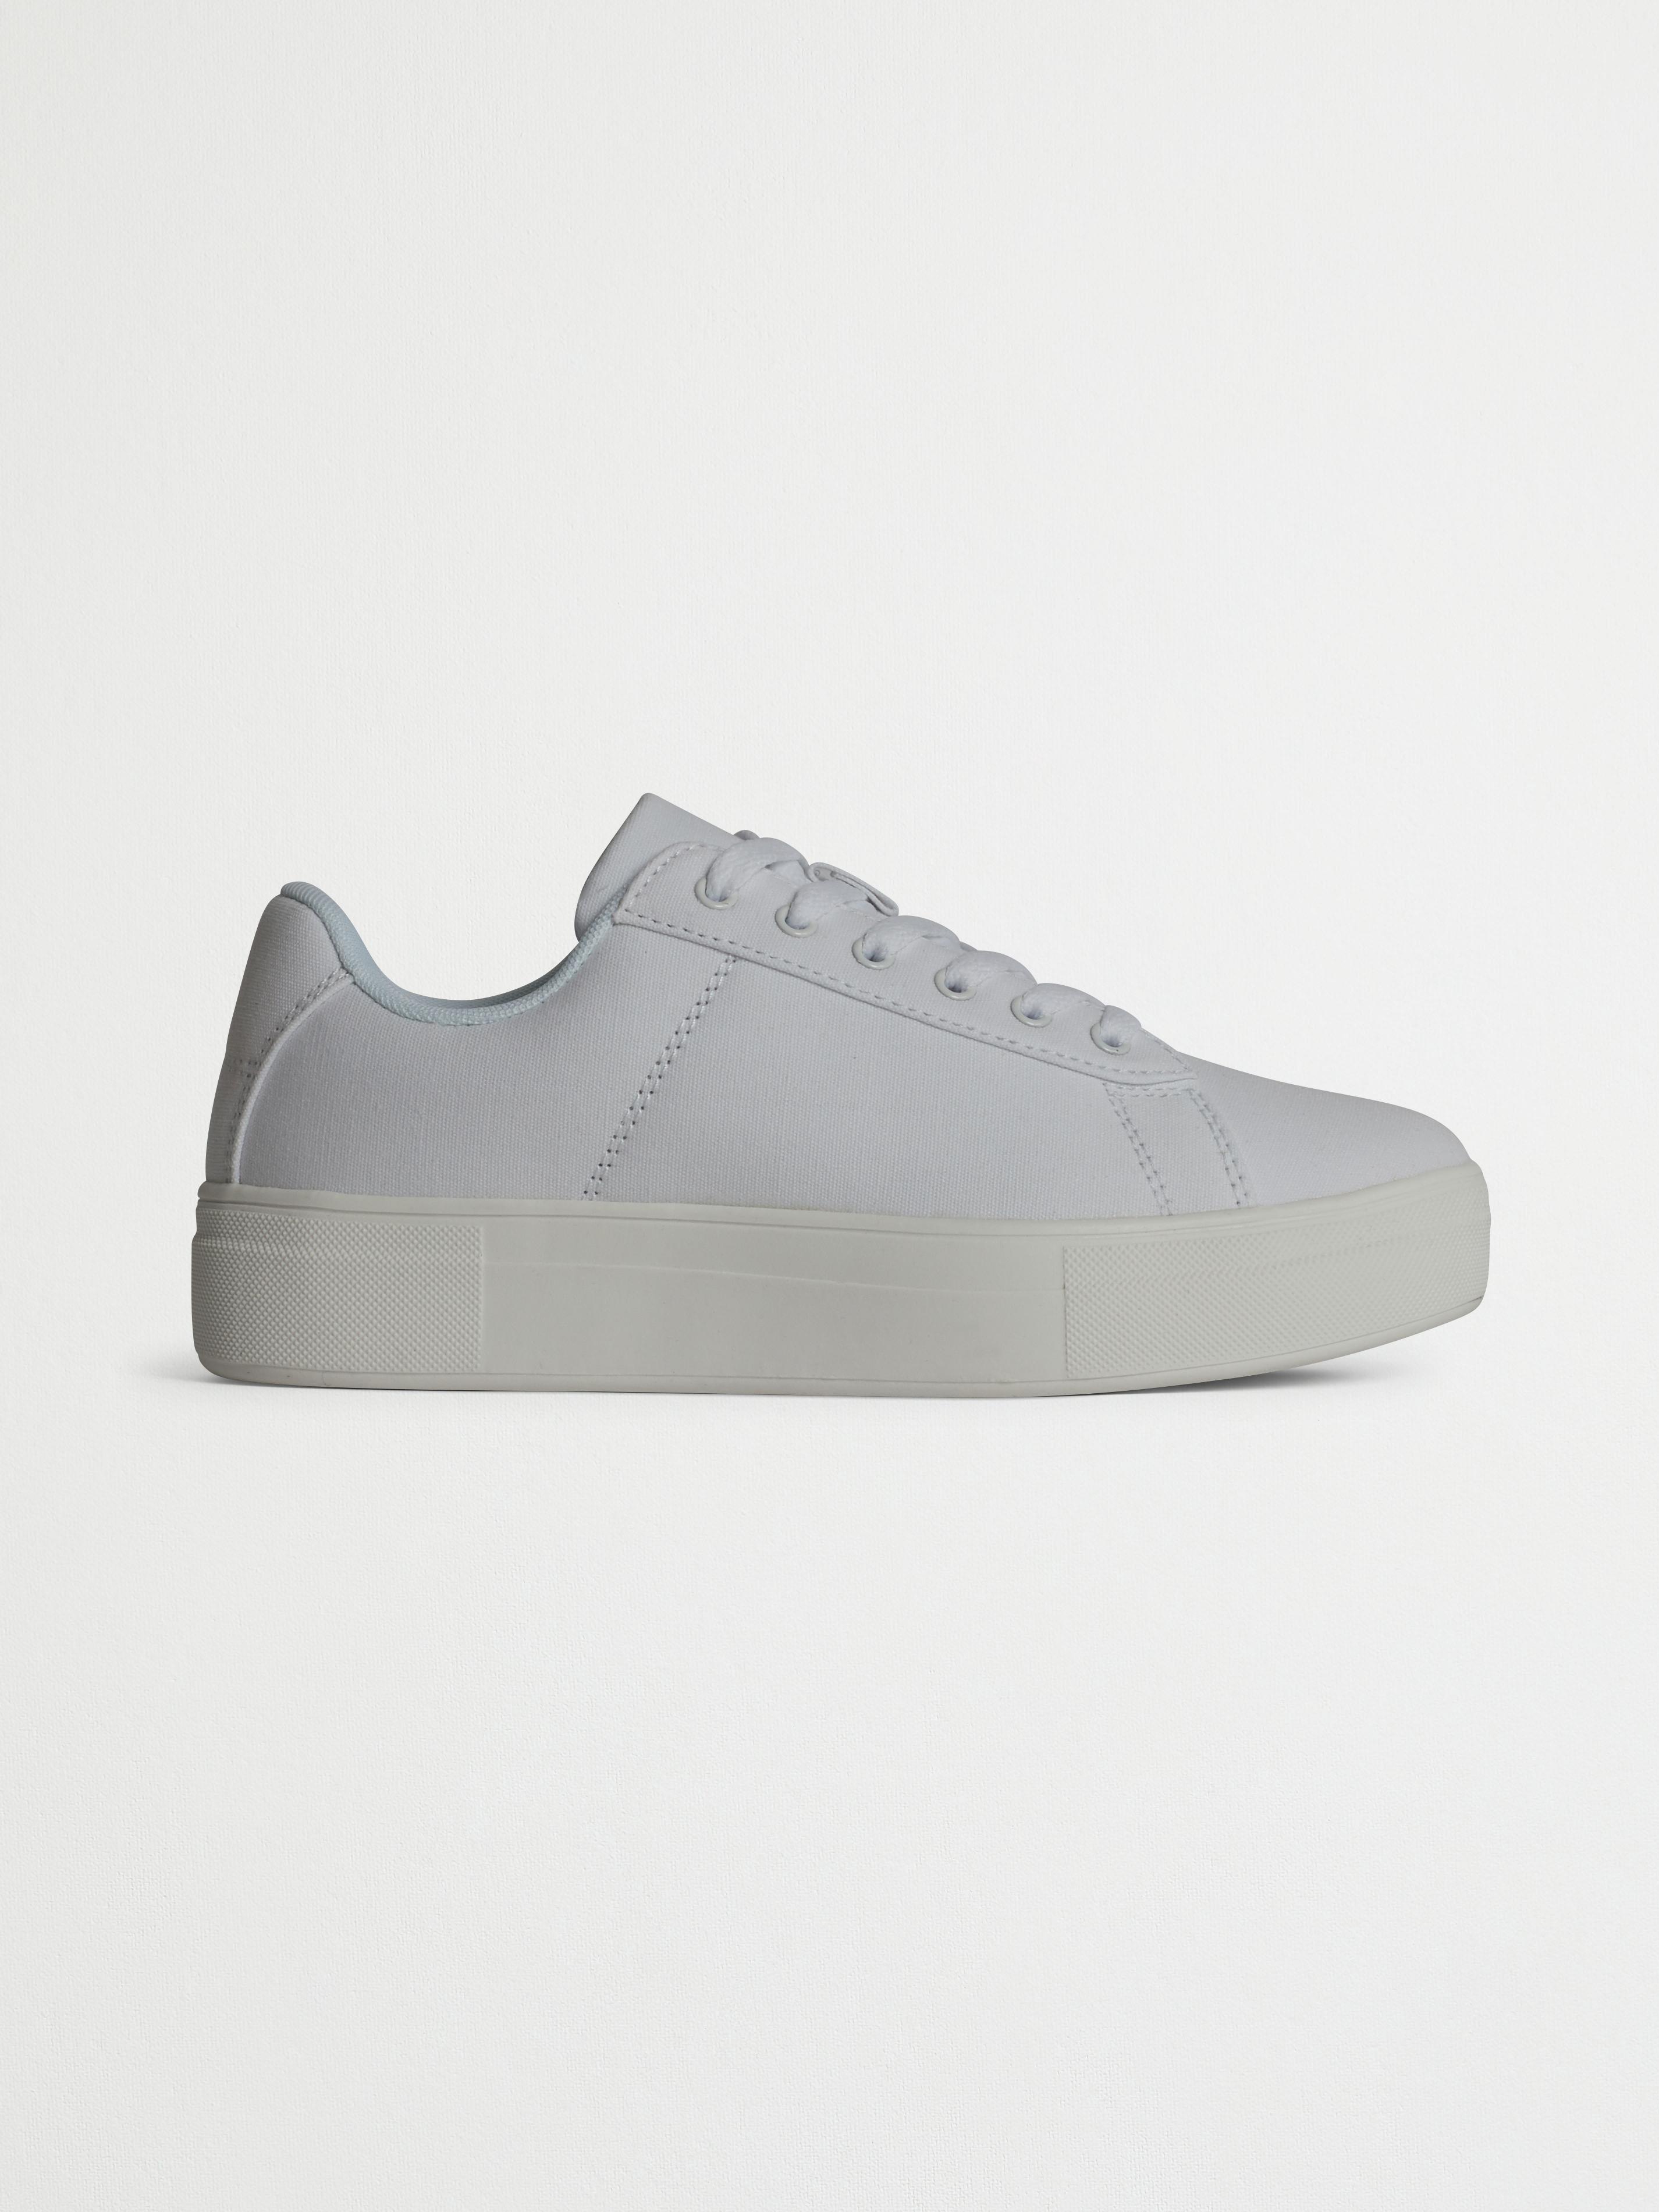 Massimo Dutti Sneakers Man Beige Skor Låga Köpa Online